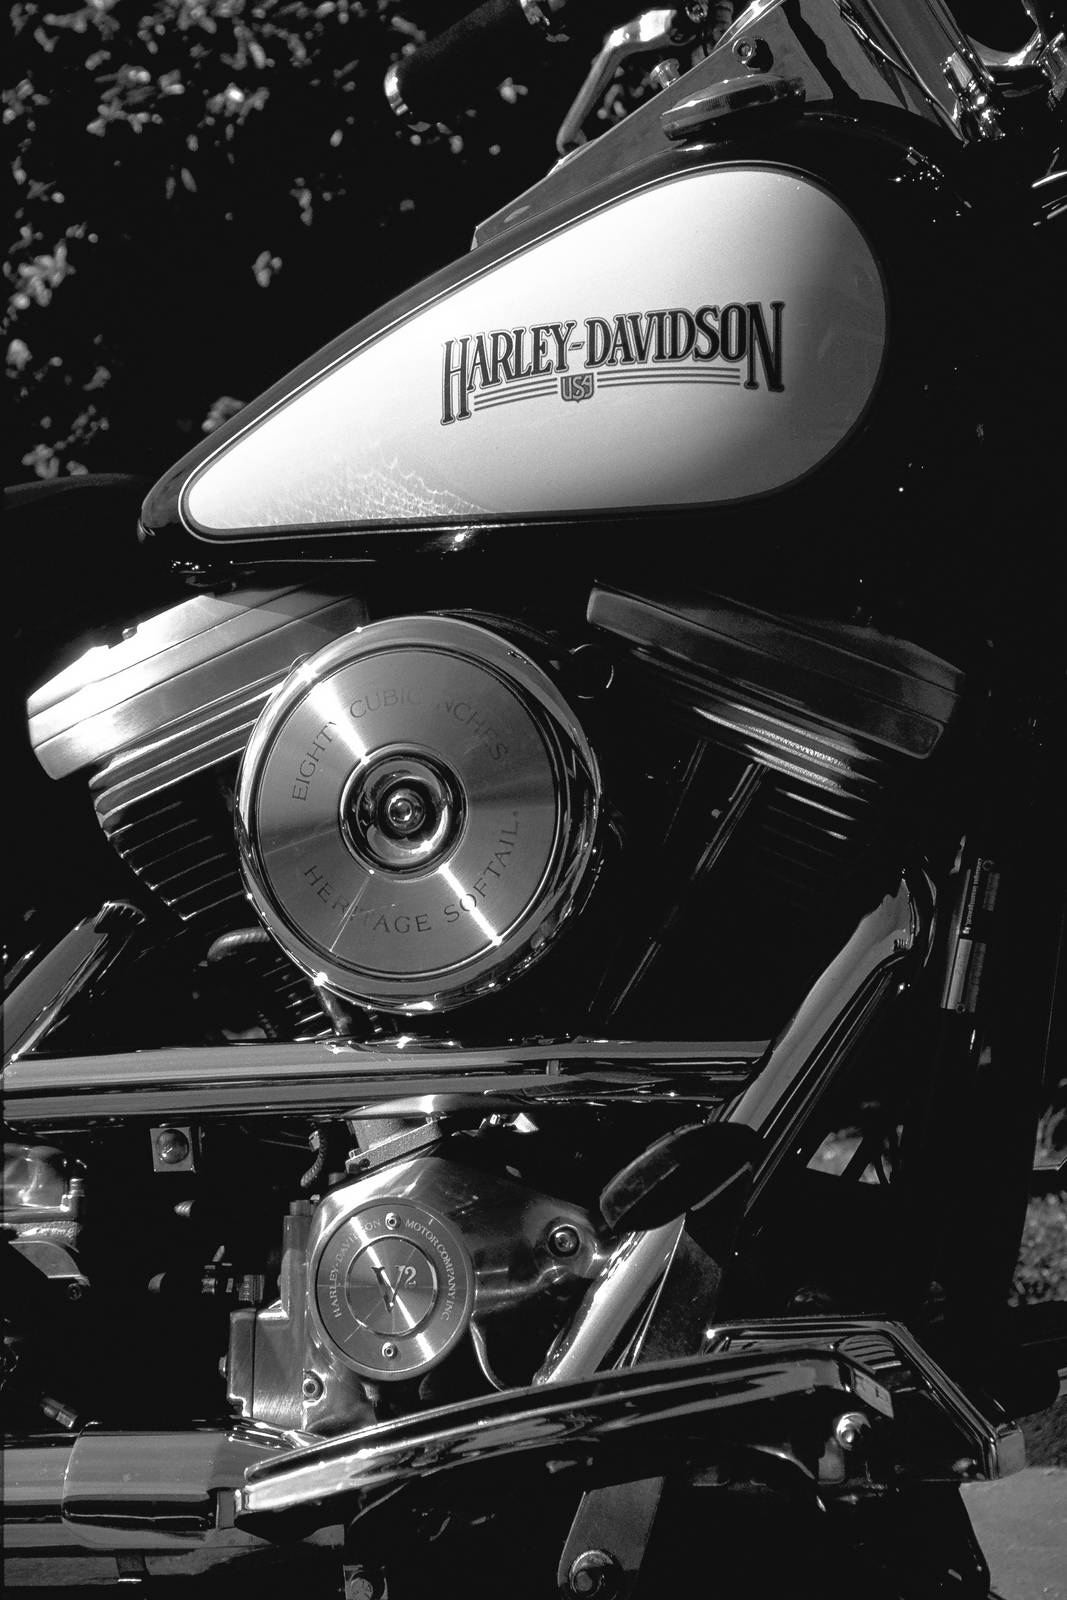 Harley Davidson, Heritage softail